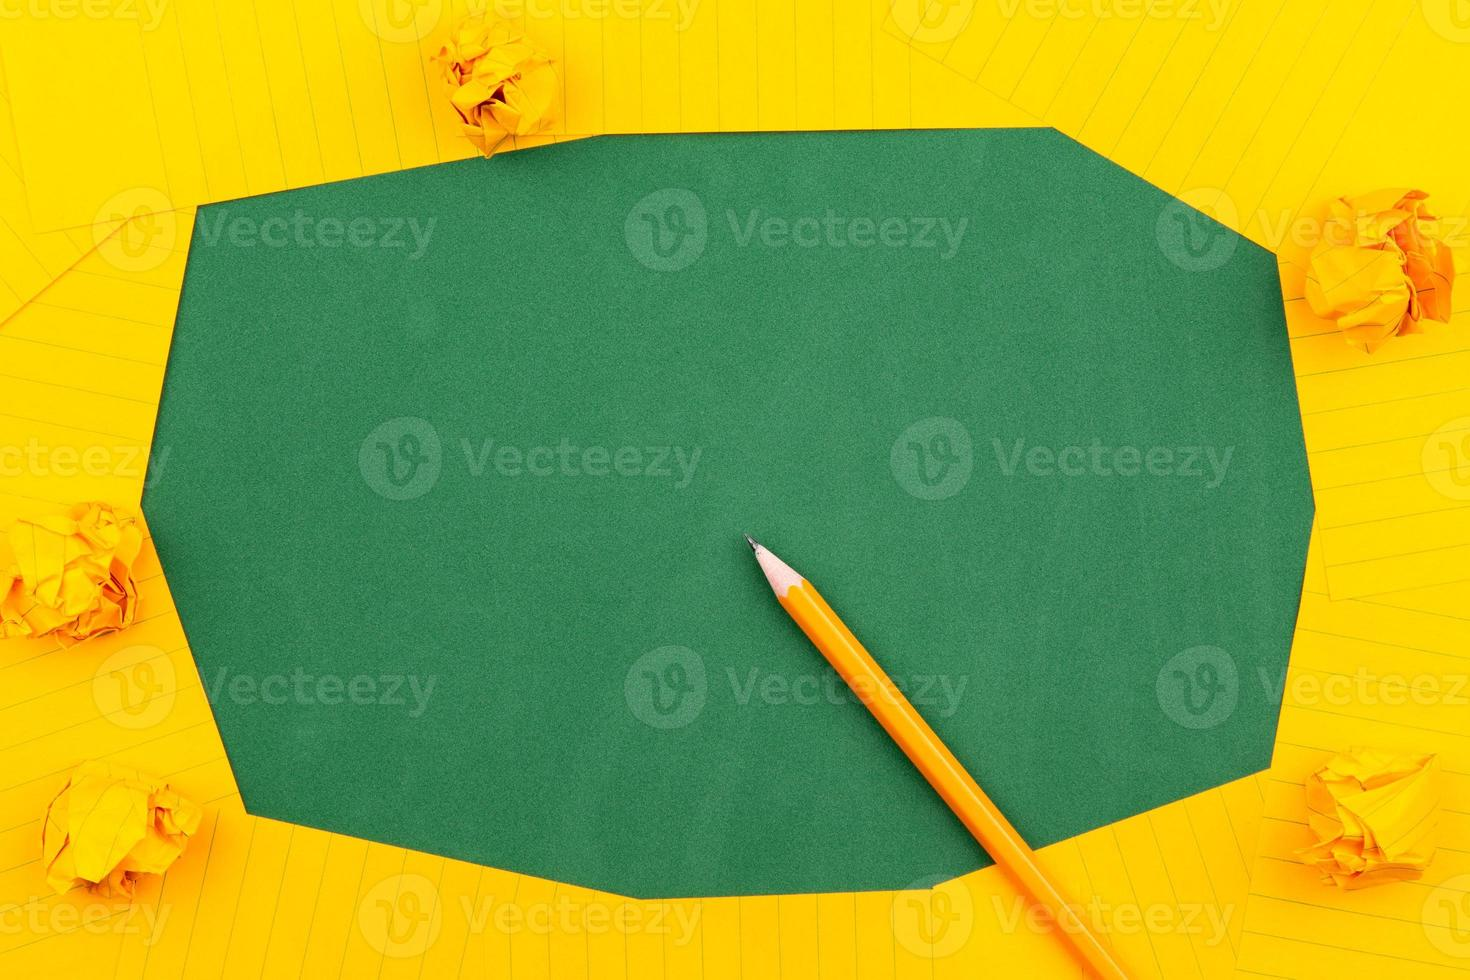 An orange sheet of paper lies on a green school board photo